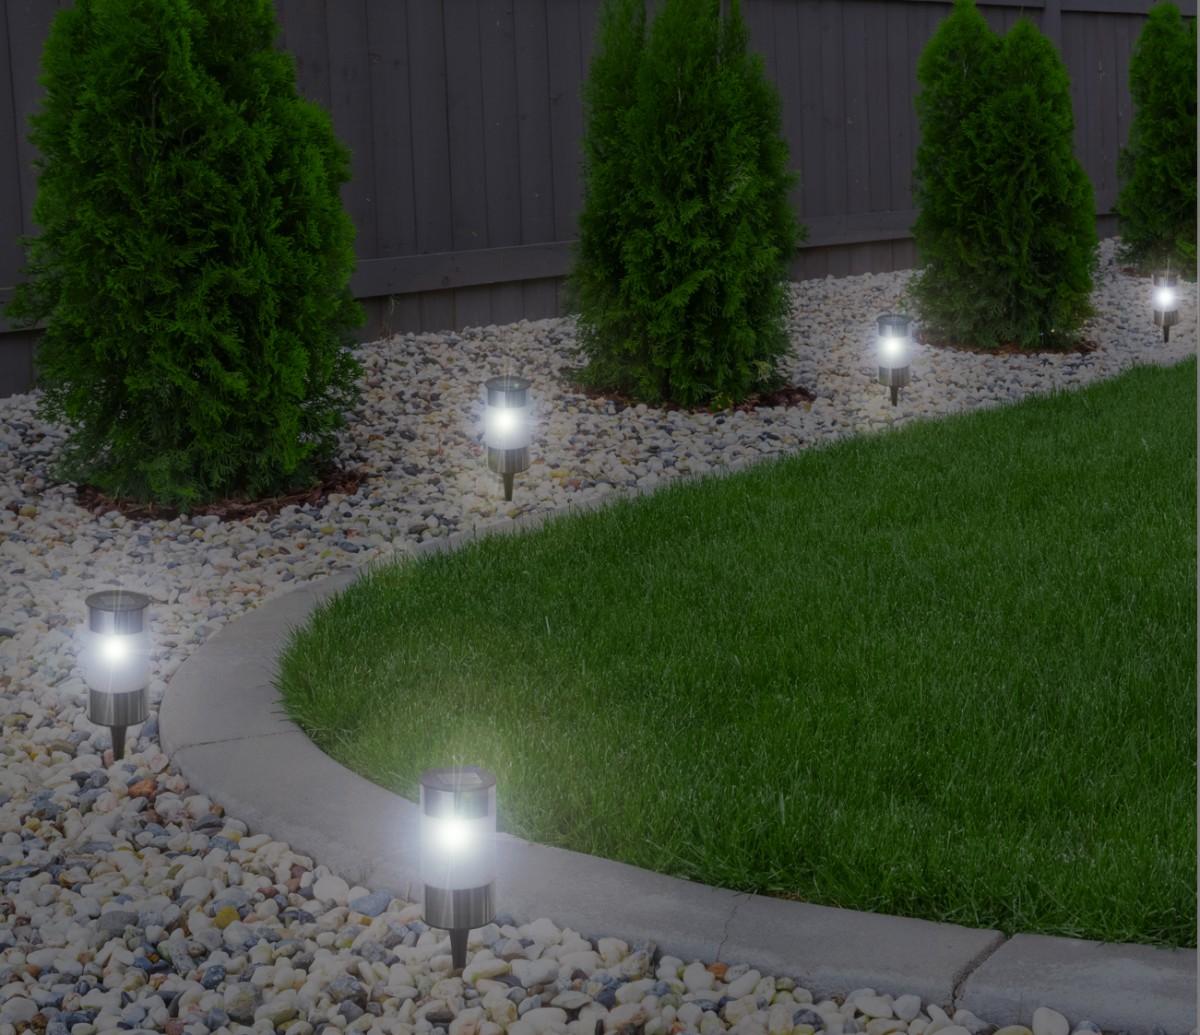 Led Solarleuchte Solarlampe Solarstick Wegbeleuchtung Gartendekoration